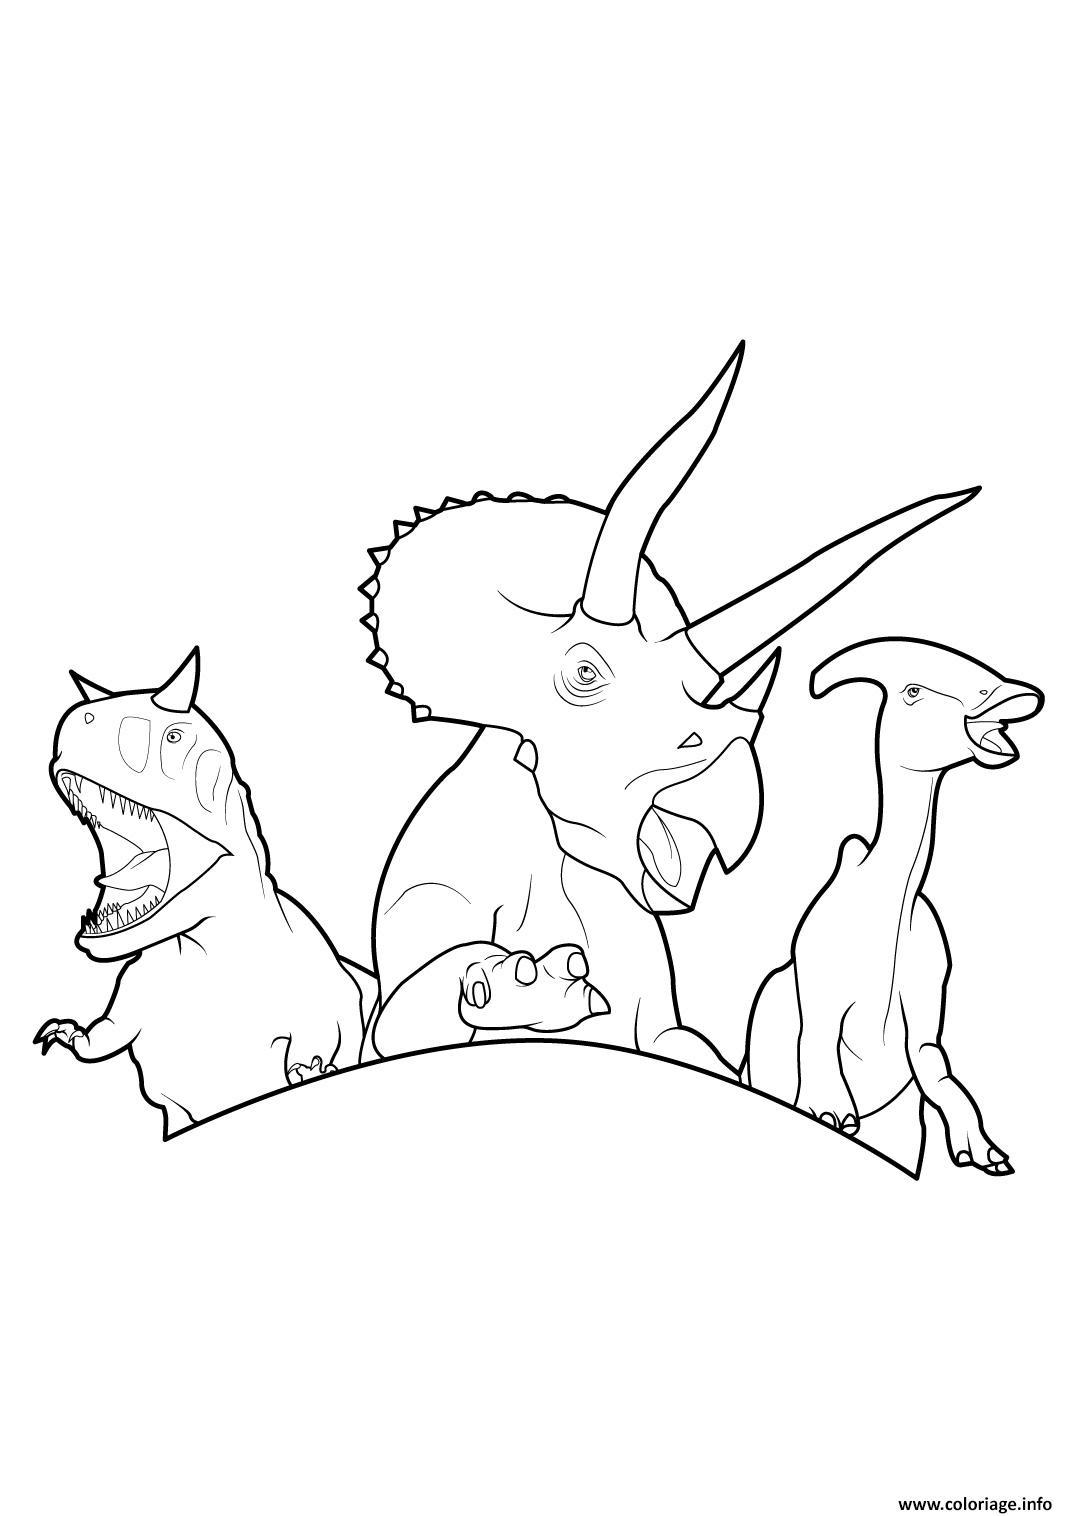 Coloriage dinosaure 363 dessin - Dessin dinosaure a imprimer ...